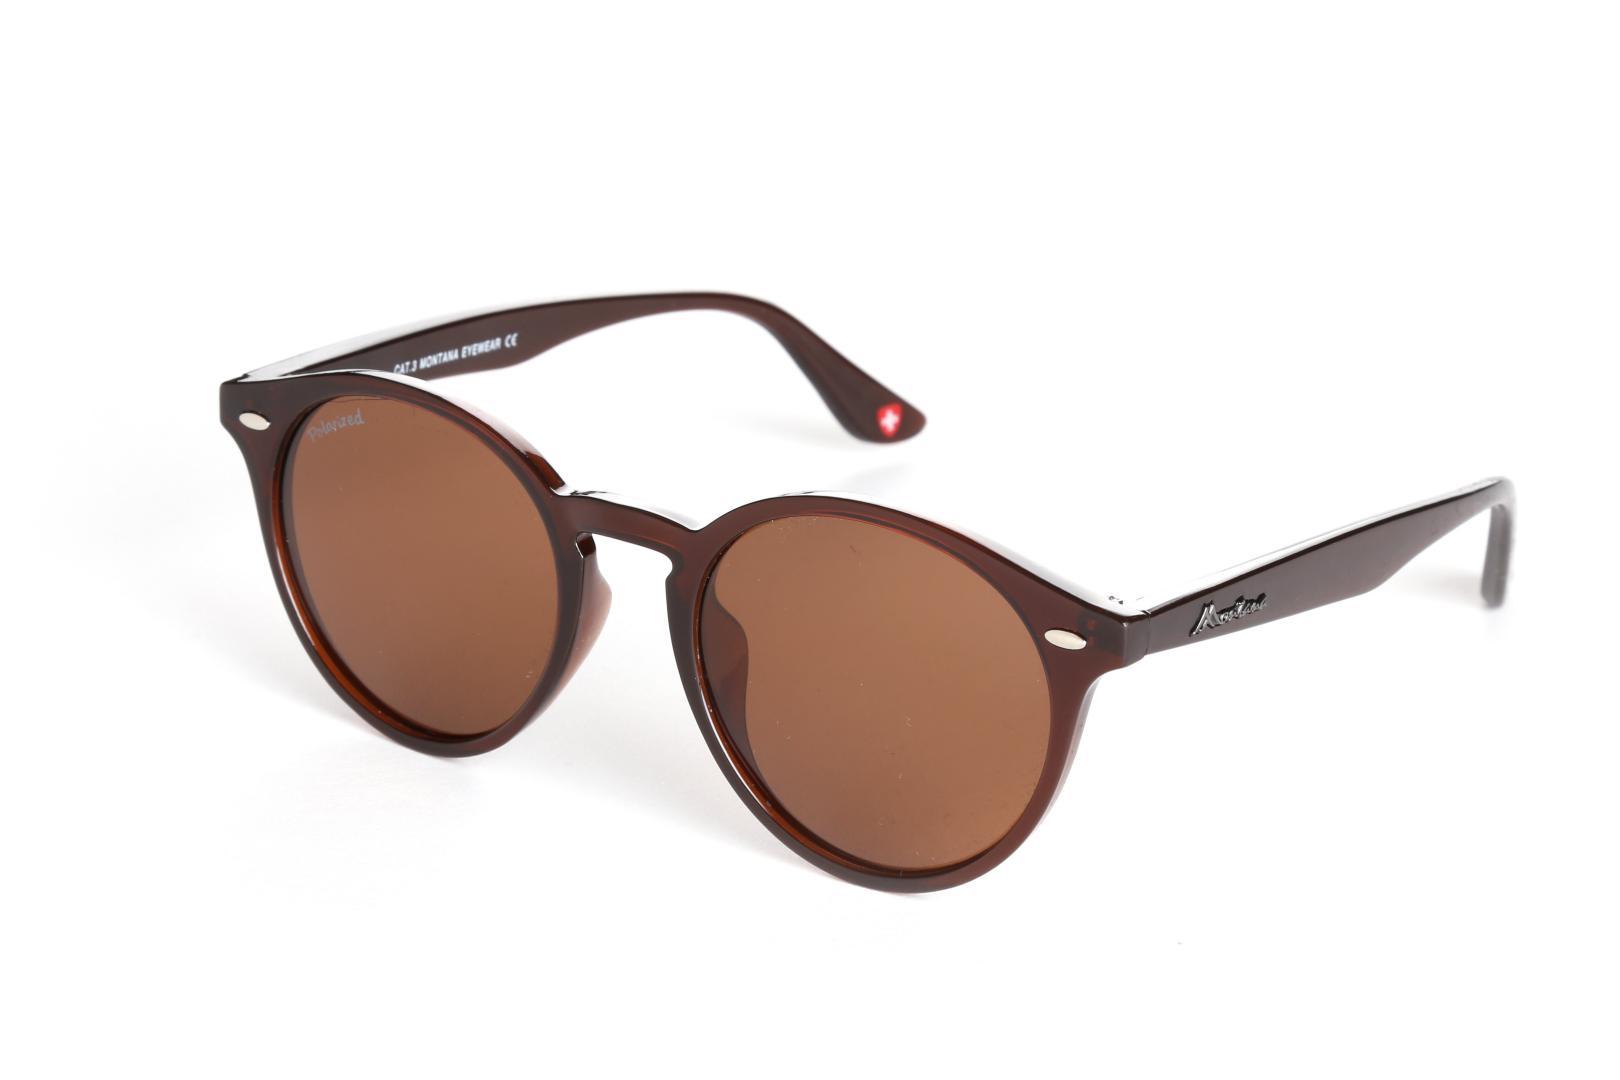 Montana Eyewear MP20-Braun rzQ7gvoO